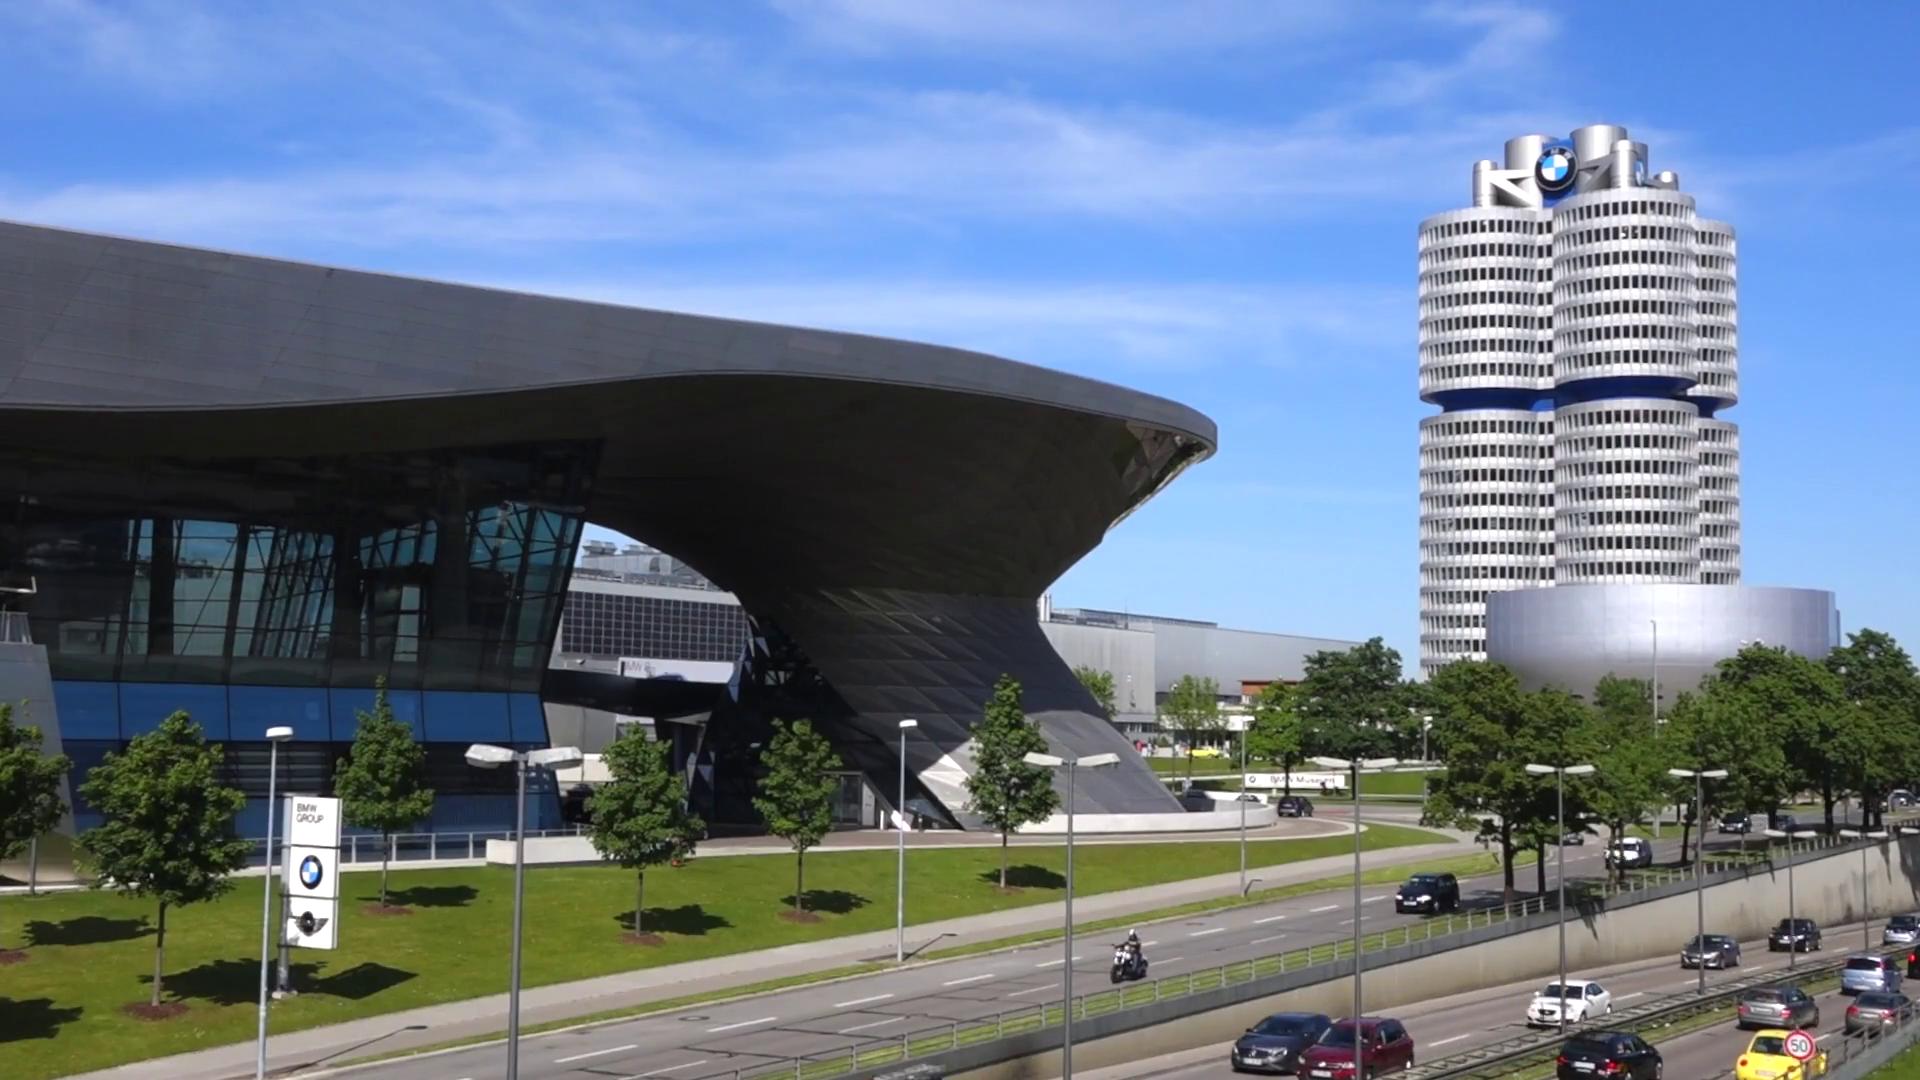 Name:  videoblocks-bmw-welt-bmw-museum-and-bmw-headquarters-munich-bavaria-germany-europe_hjkbc0pfz_thu.png Views: 2561 Size:  2.43 MB